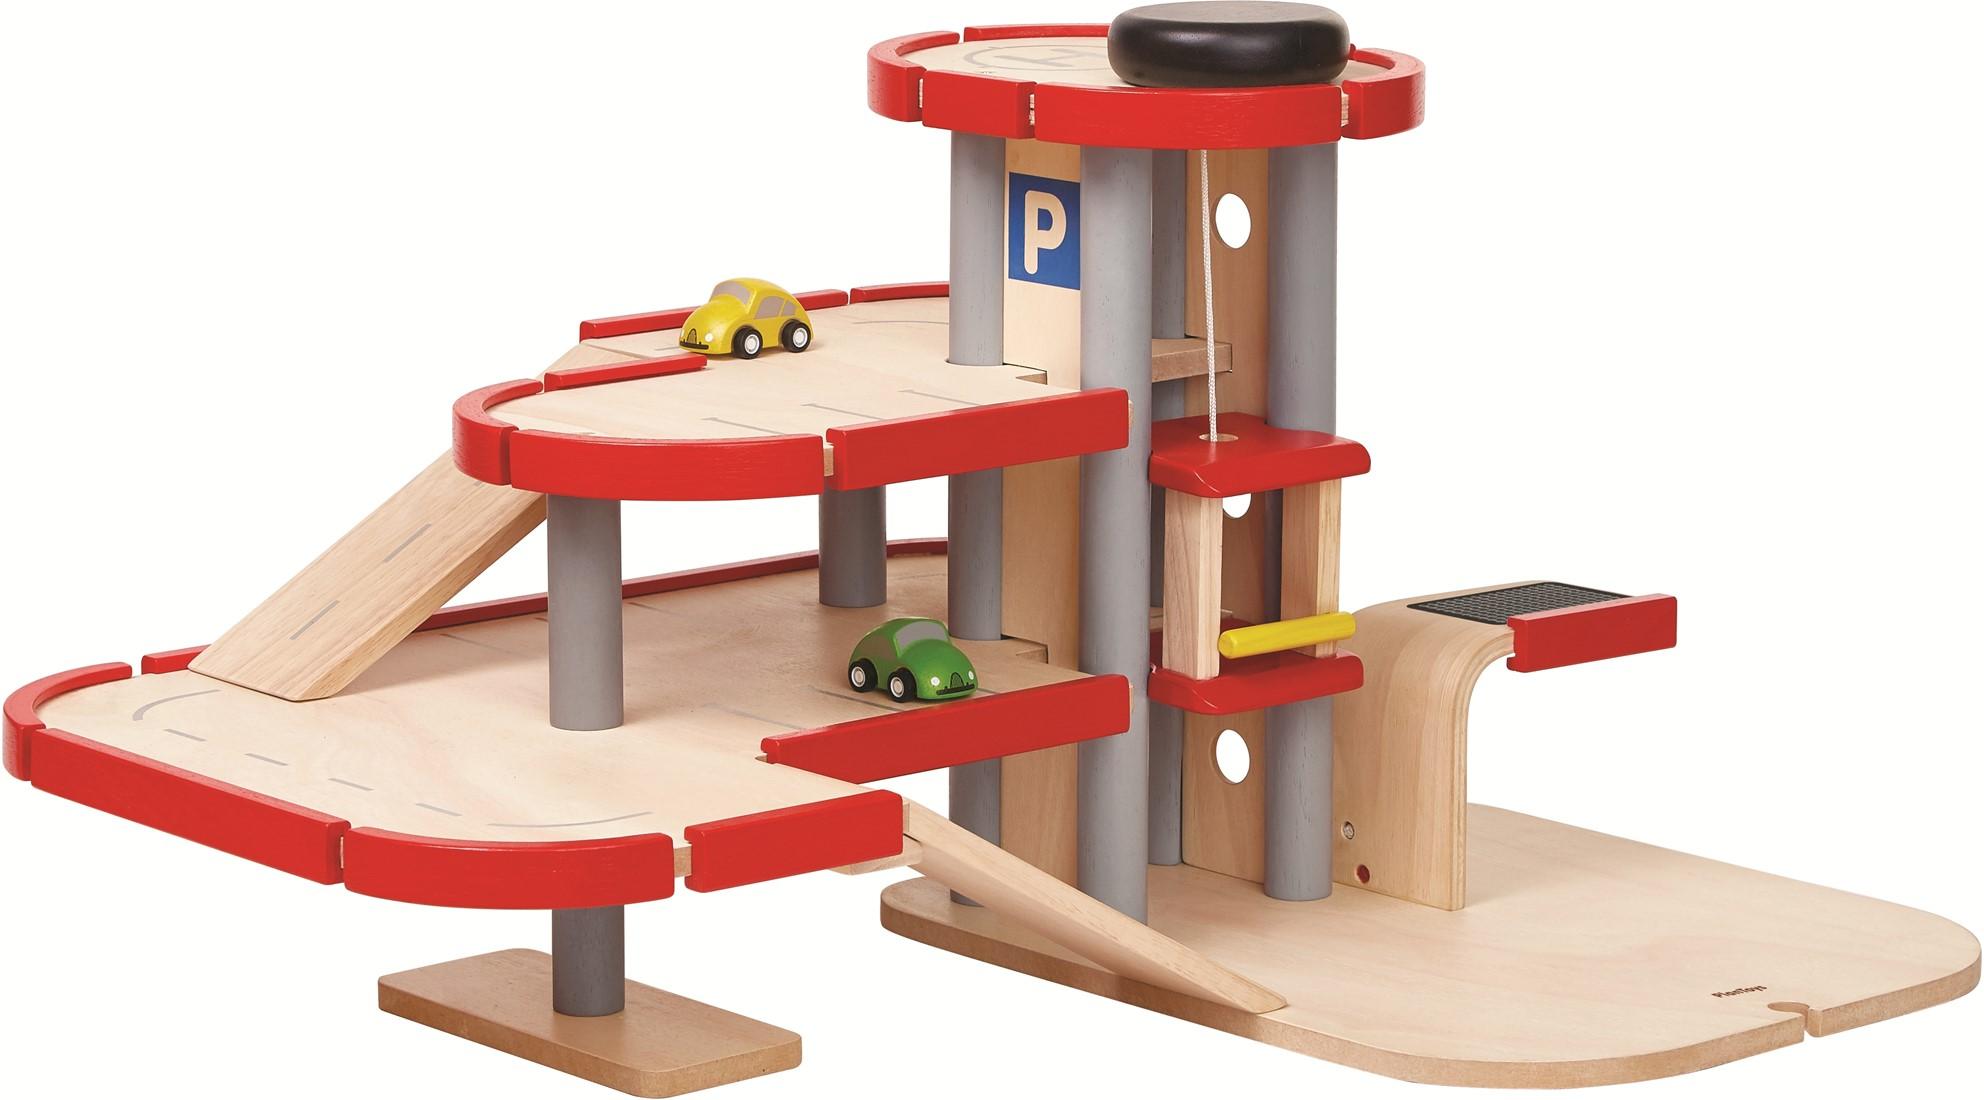 Speelgoed Garage Hout : Plan toys houten speelgoed garage